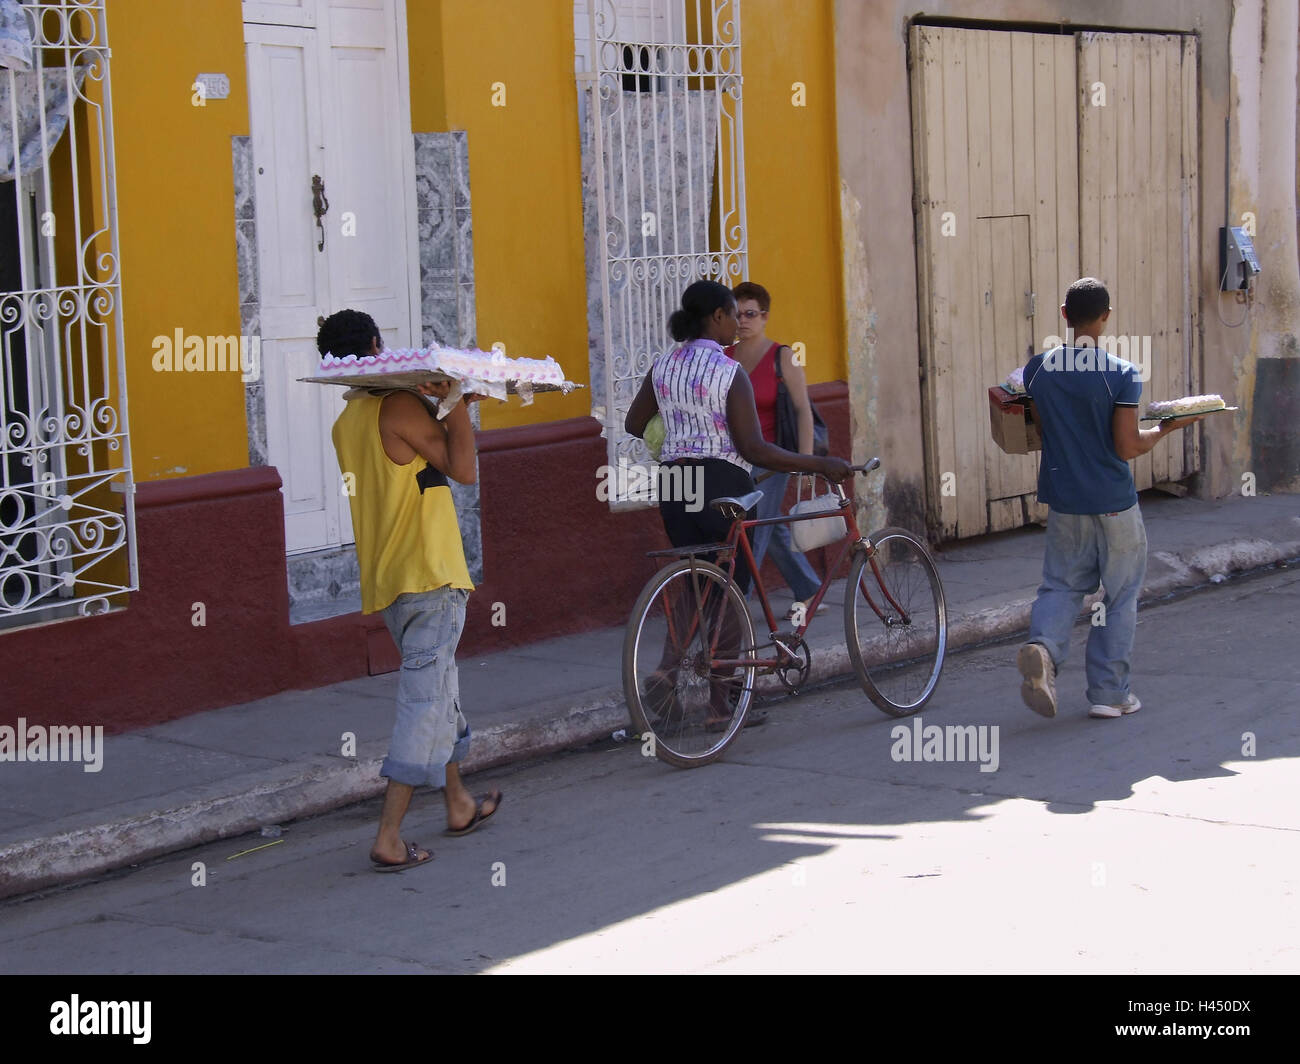 Straßenszene, Männer, Carry, Kuchen, Trinidad, Kuba, Urlaub ...